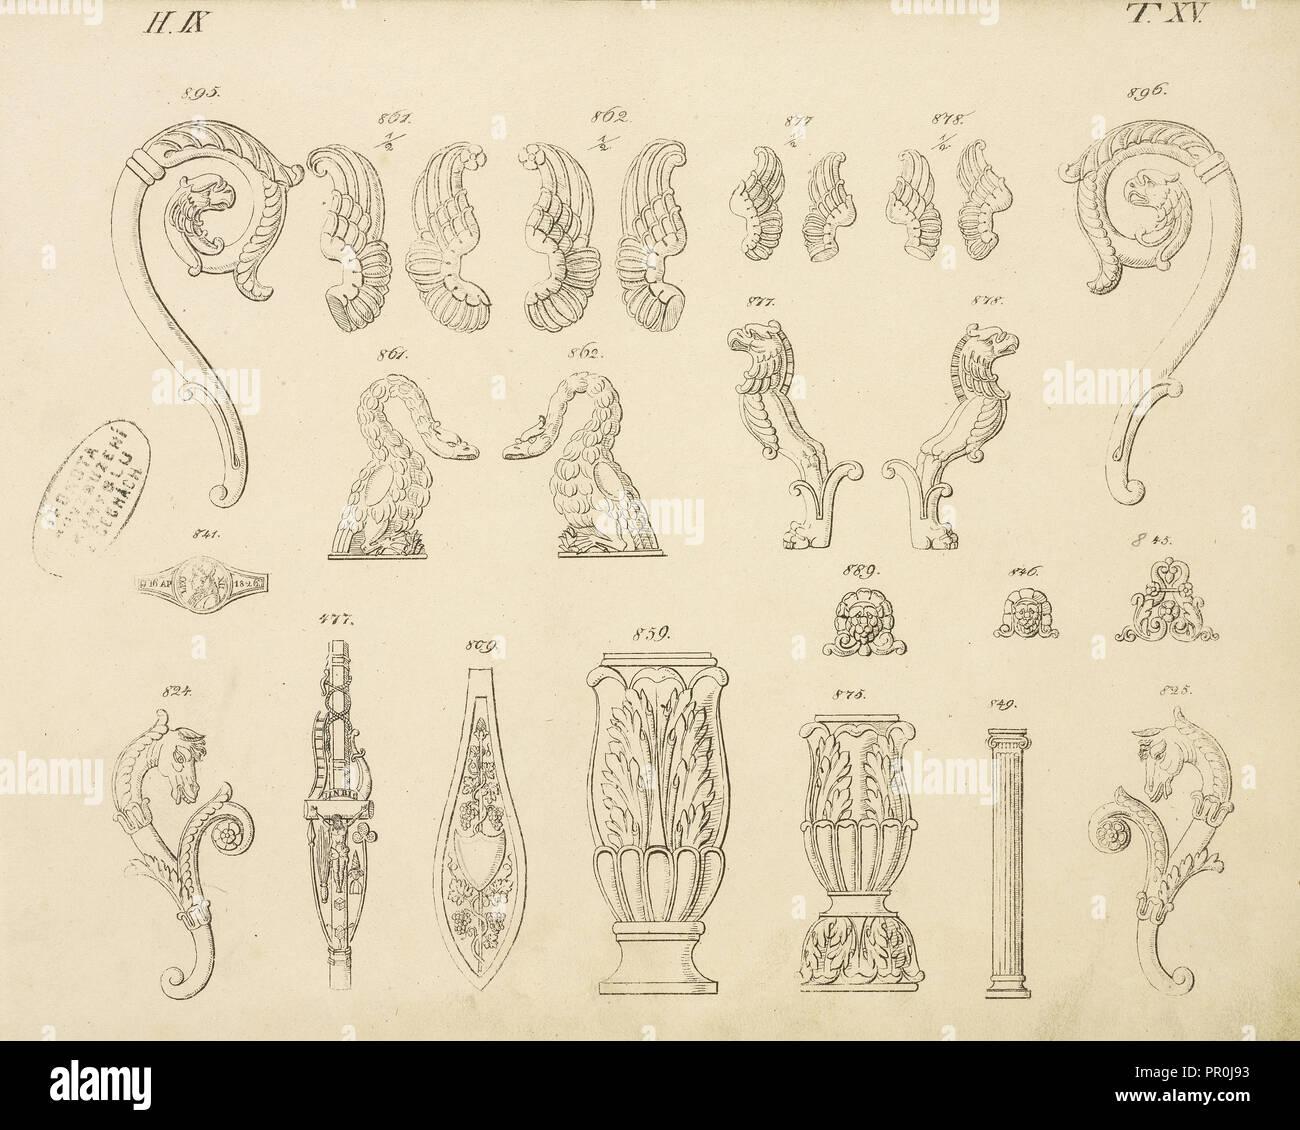 Animal and floral ornaments, Abbildungen von geprägten Ornamenten: Heft I-XII, Bruckmann, Peter, Engraving, between 1815 - Stock Image